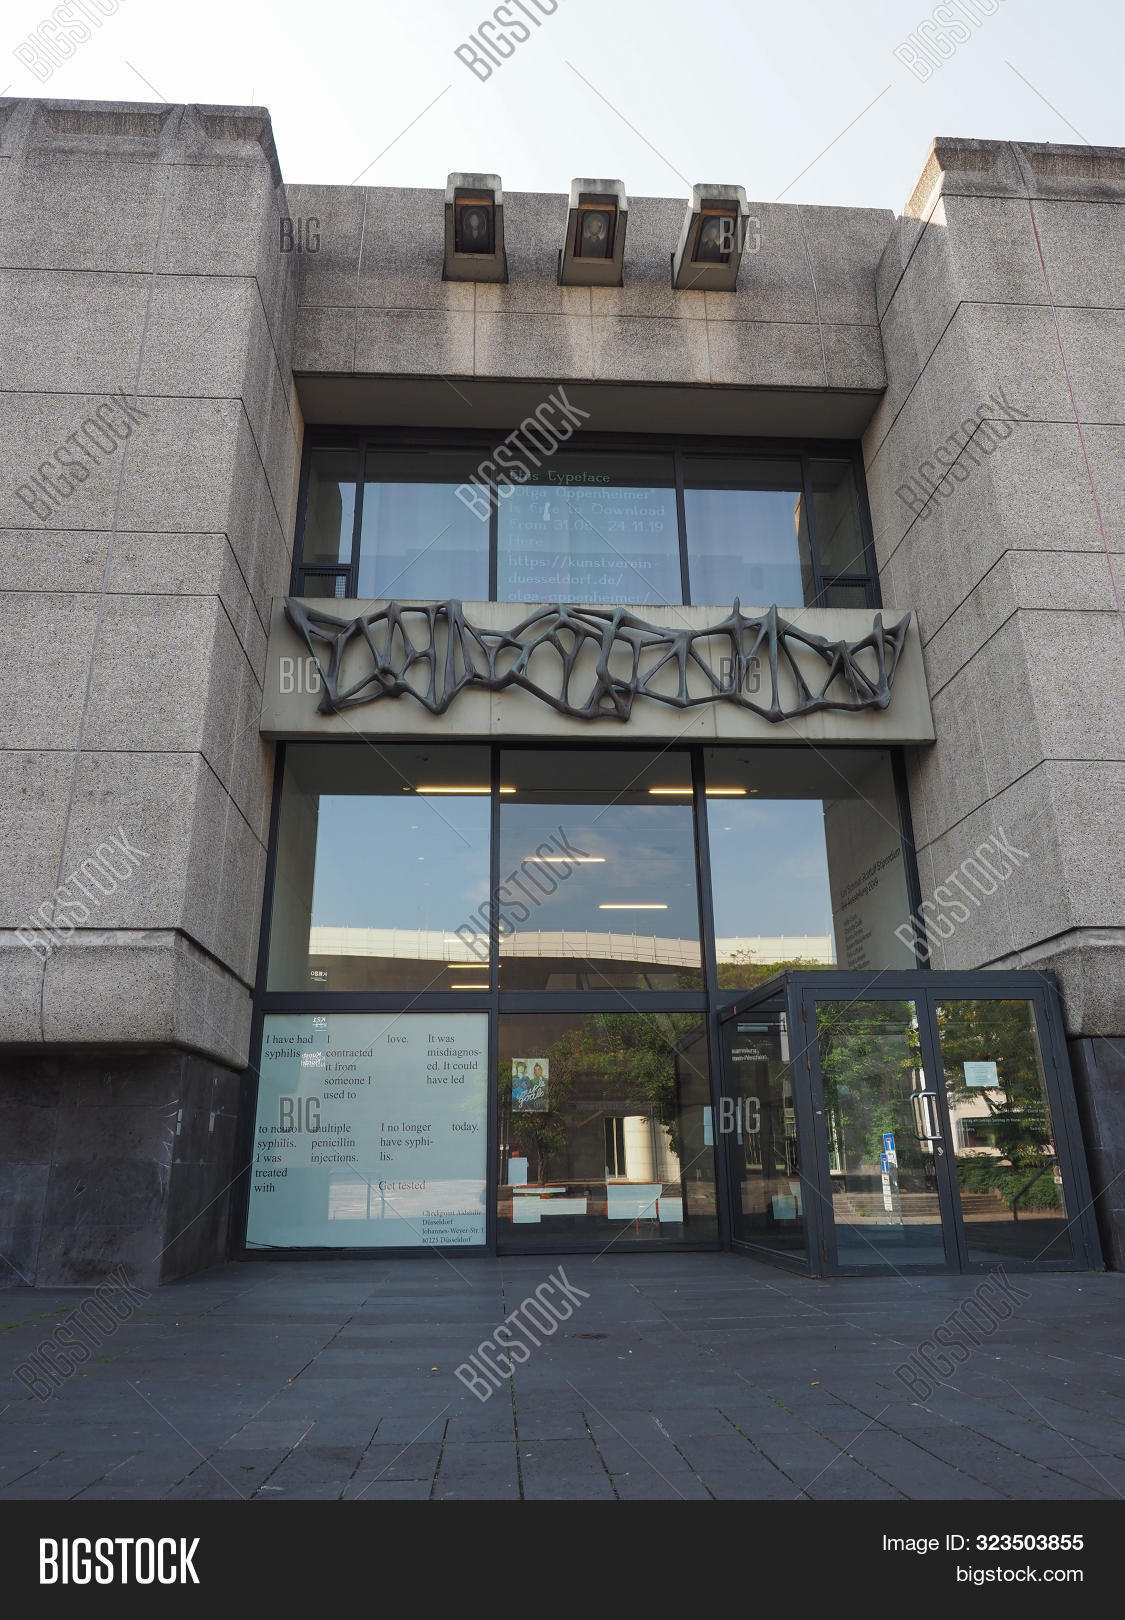 Kunsthalle Duesseldorf Image Photo Free Trial Bigstock